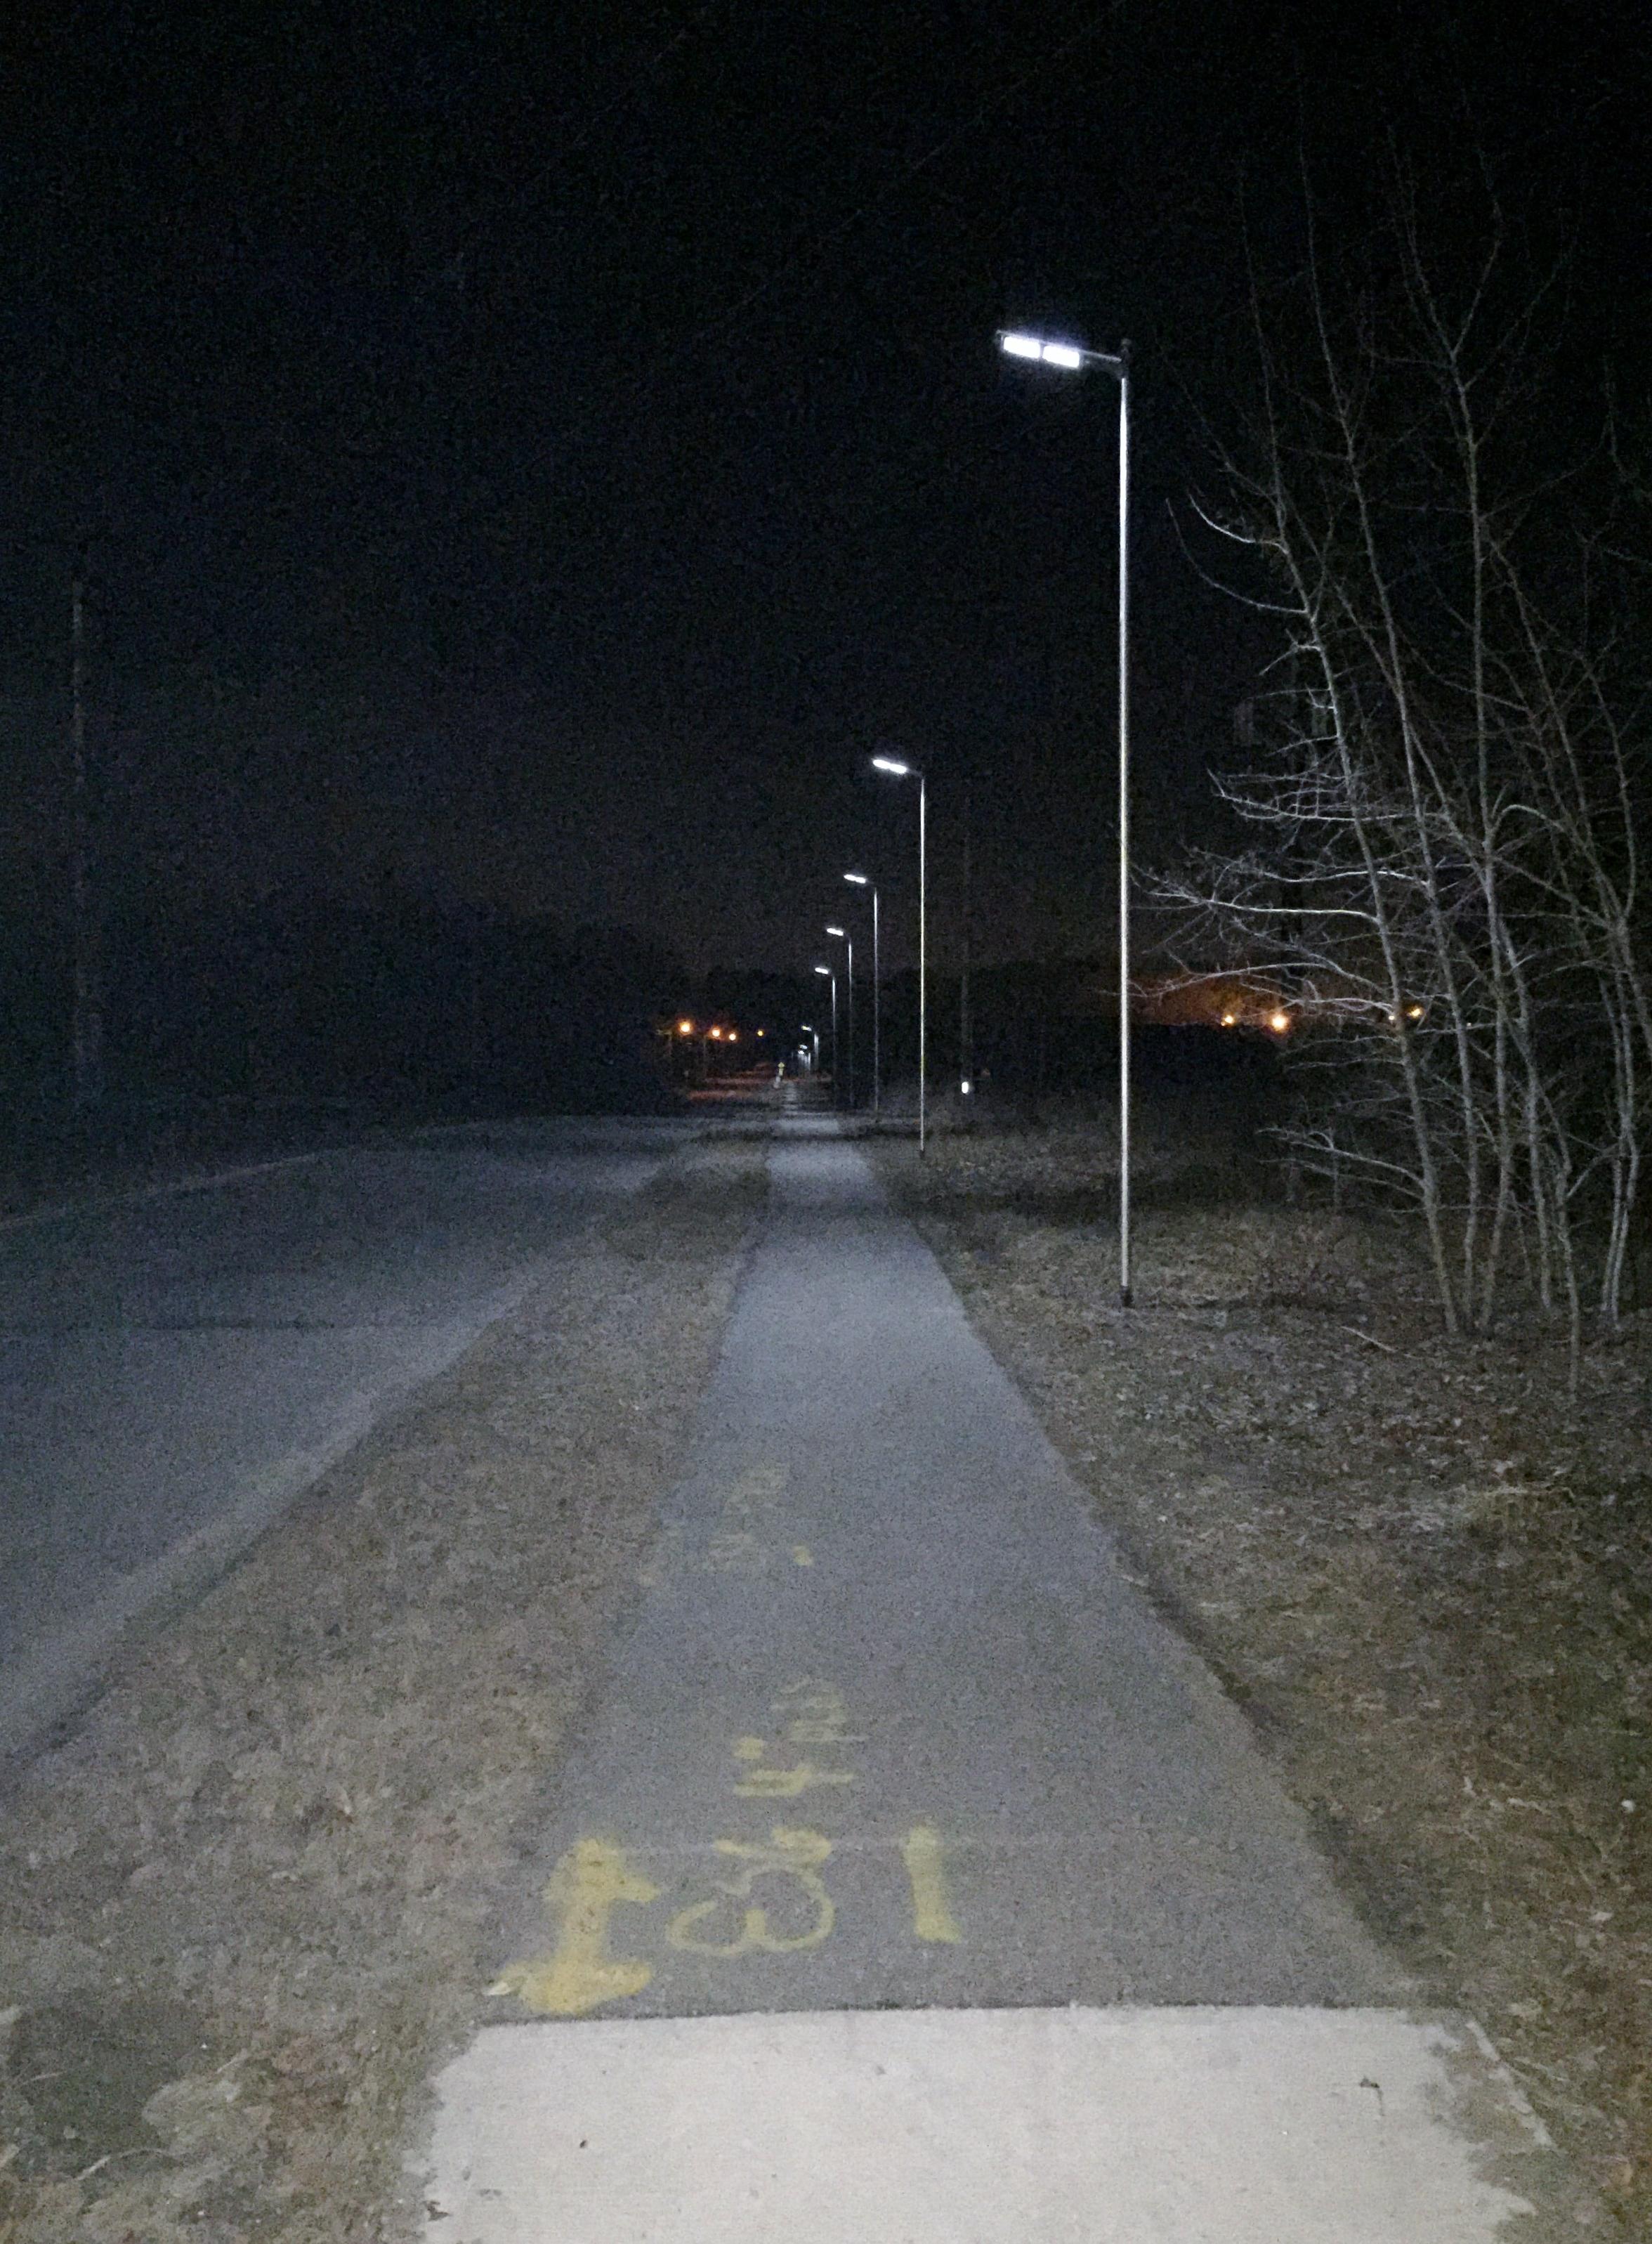 Smith Valve Solar Powered Sidewalk Lights Looking Toward the MBTA Station